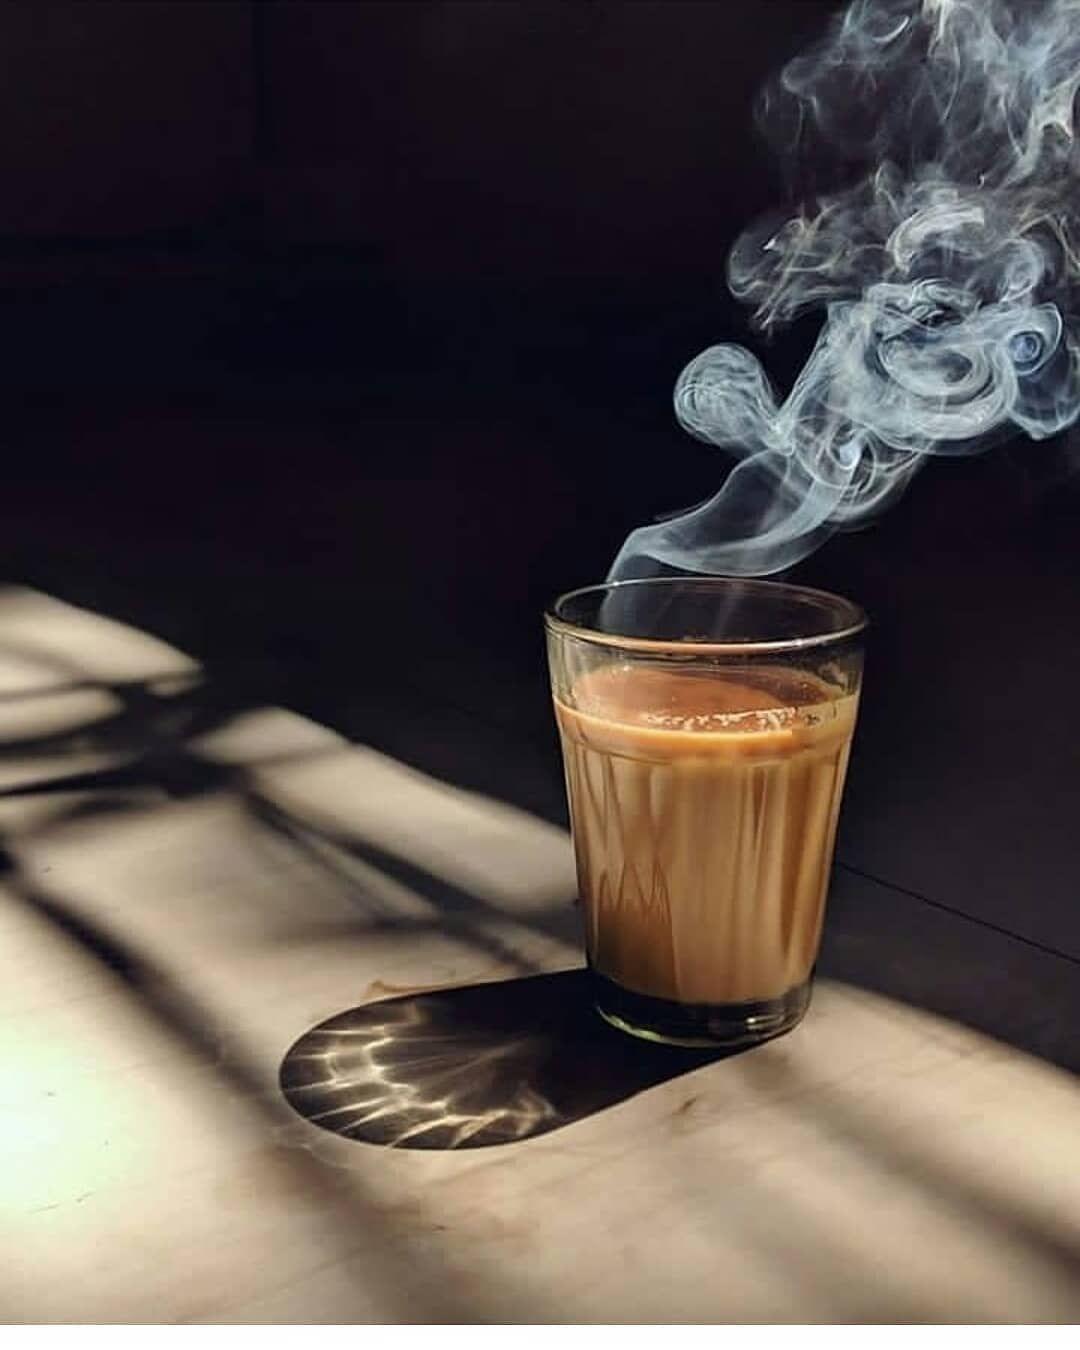 Pin By Ranadev Das On Mou Tea Wallpaper Coffee Photography